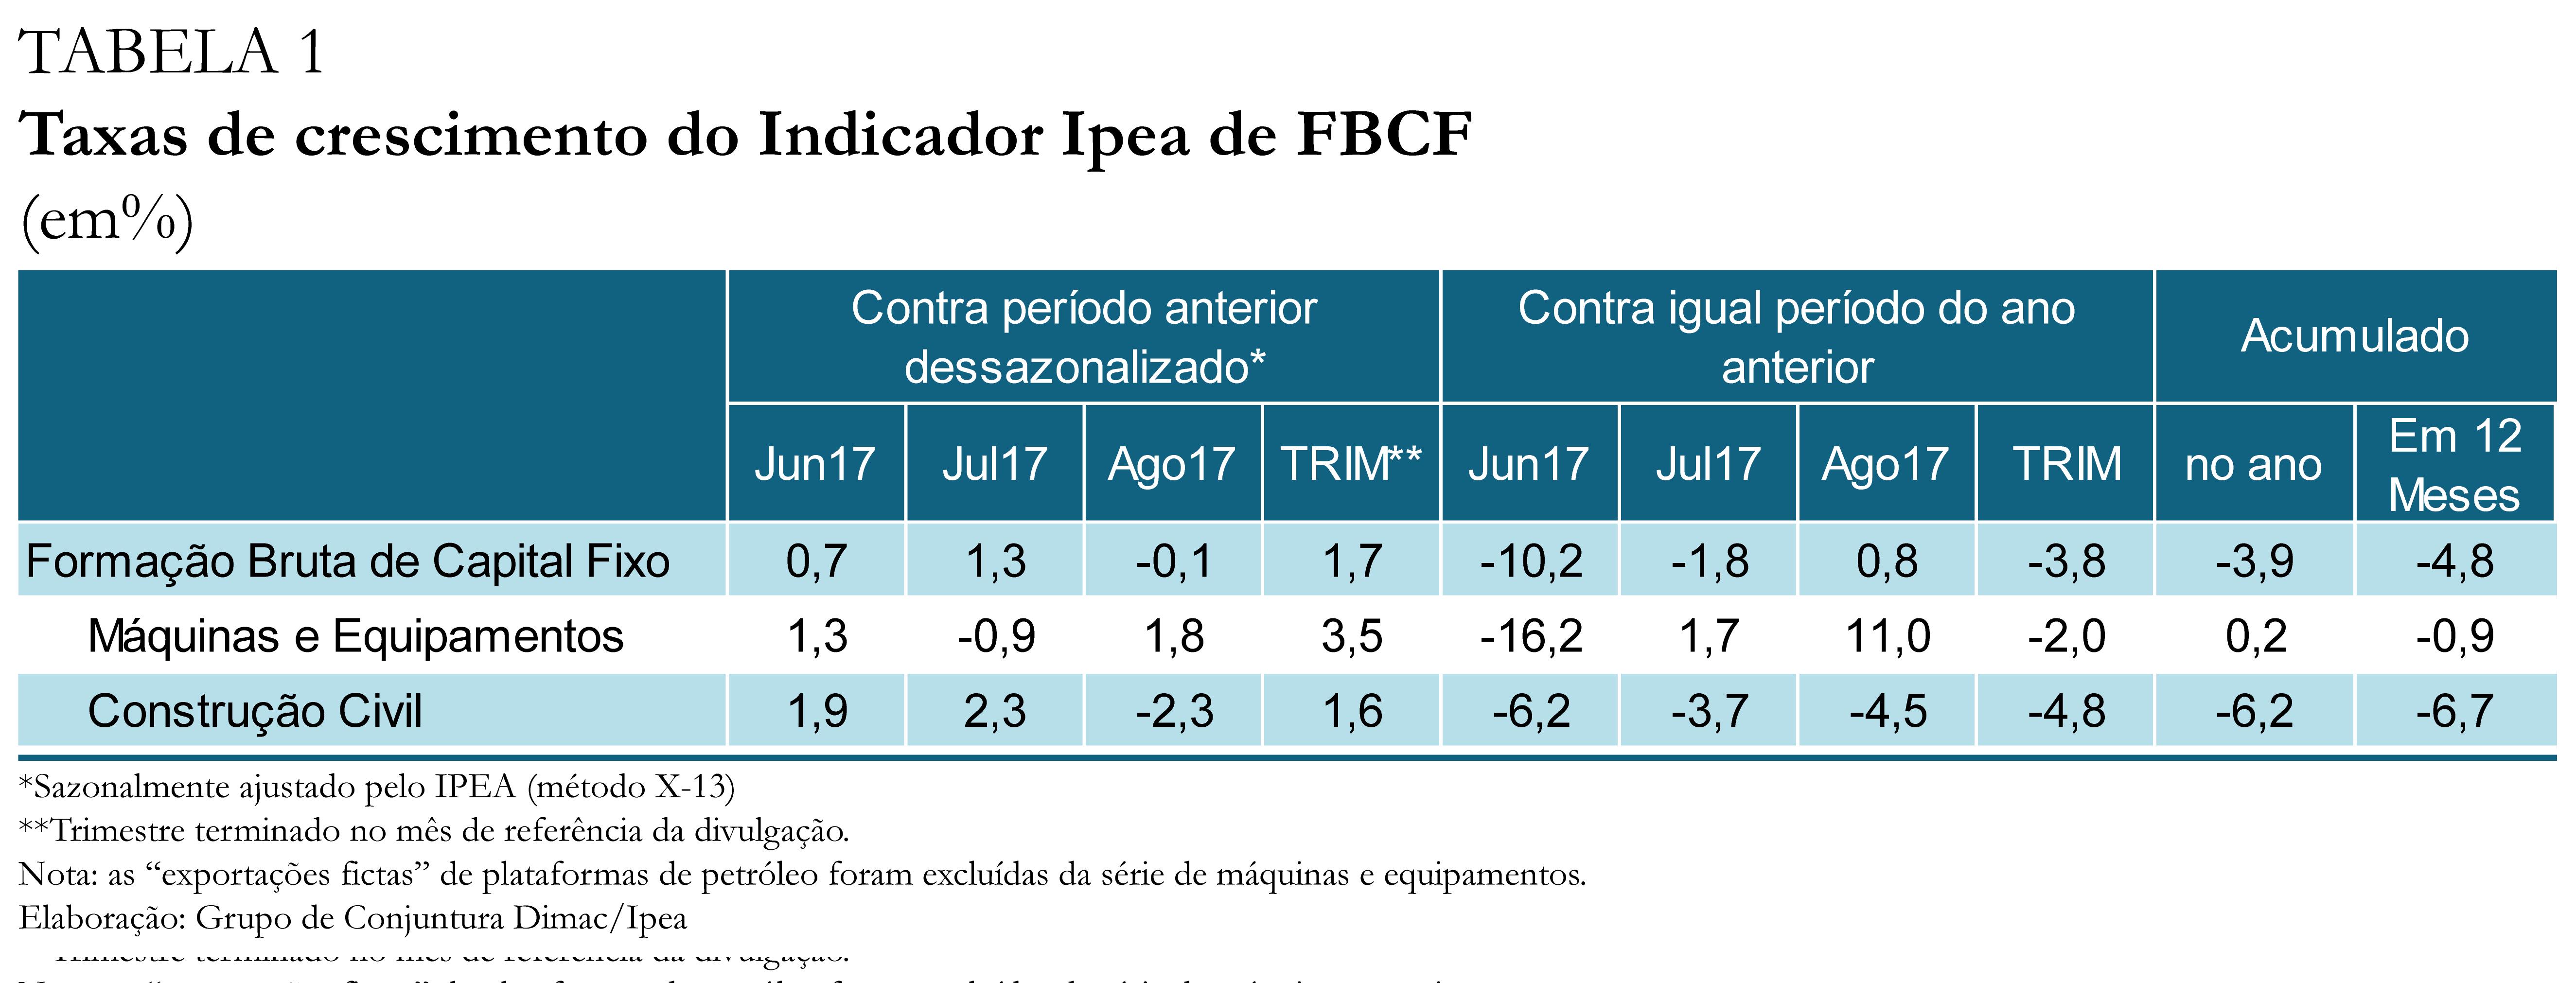 Tabela - Indicador Ipea FBCF ago17